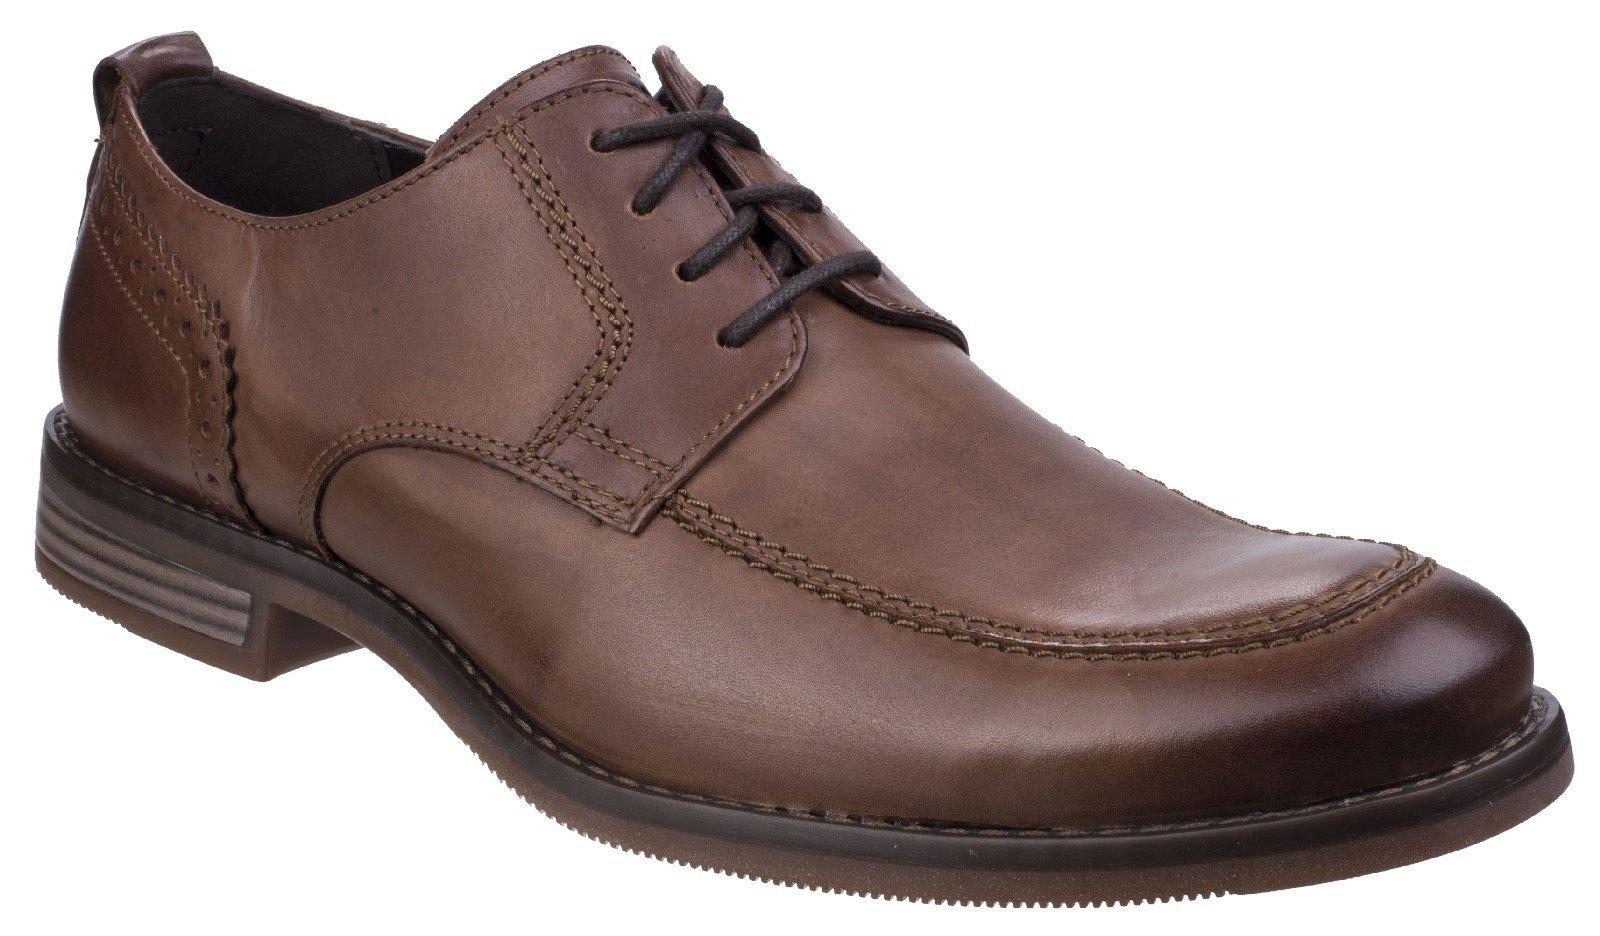 Rockport Men's Wynstin Apron Toe Lace Oxford Shoe Brown 26790 - Brown 7